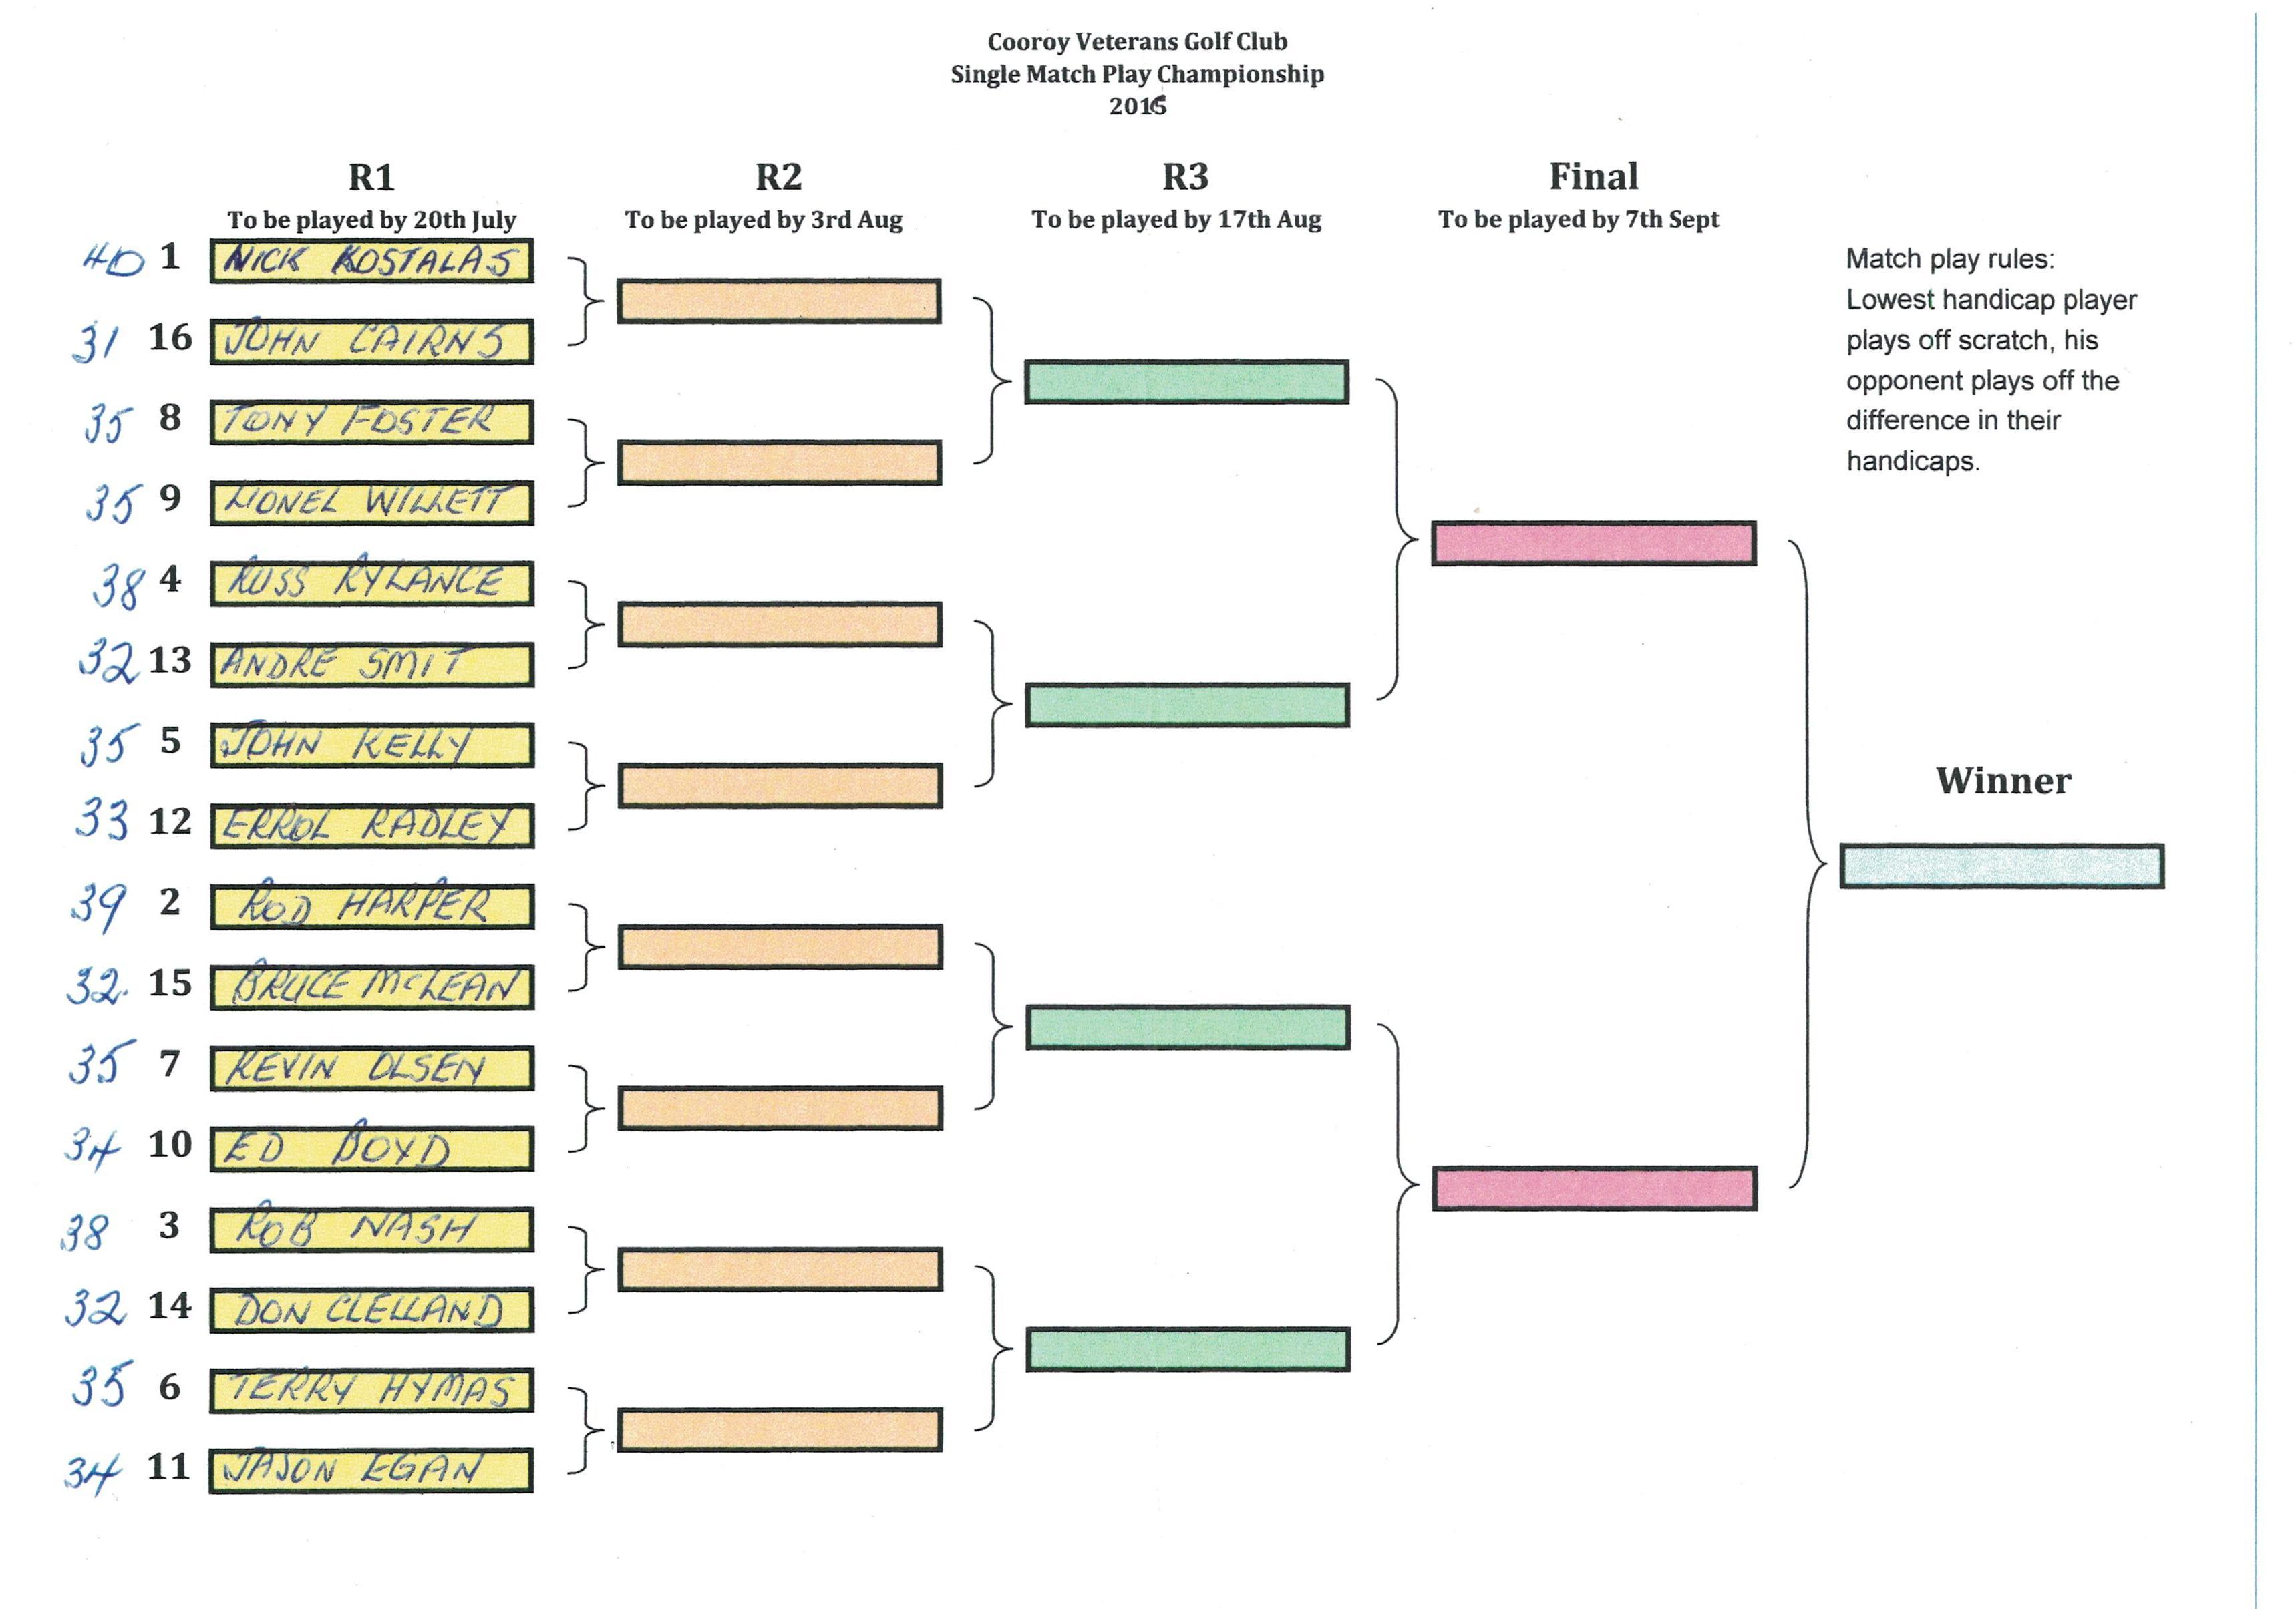 2016 07 06 - Single Match Play Draw